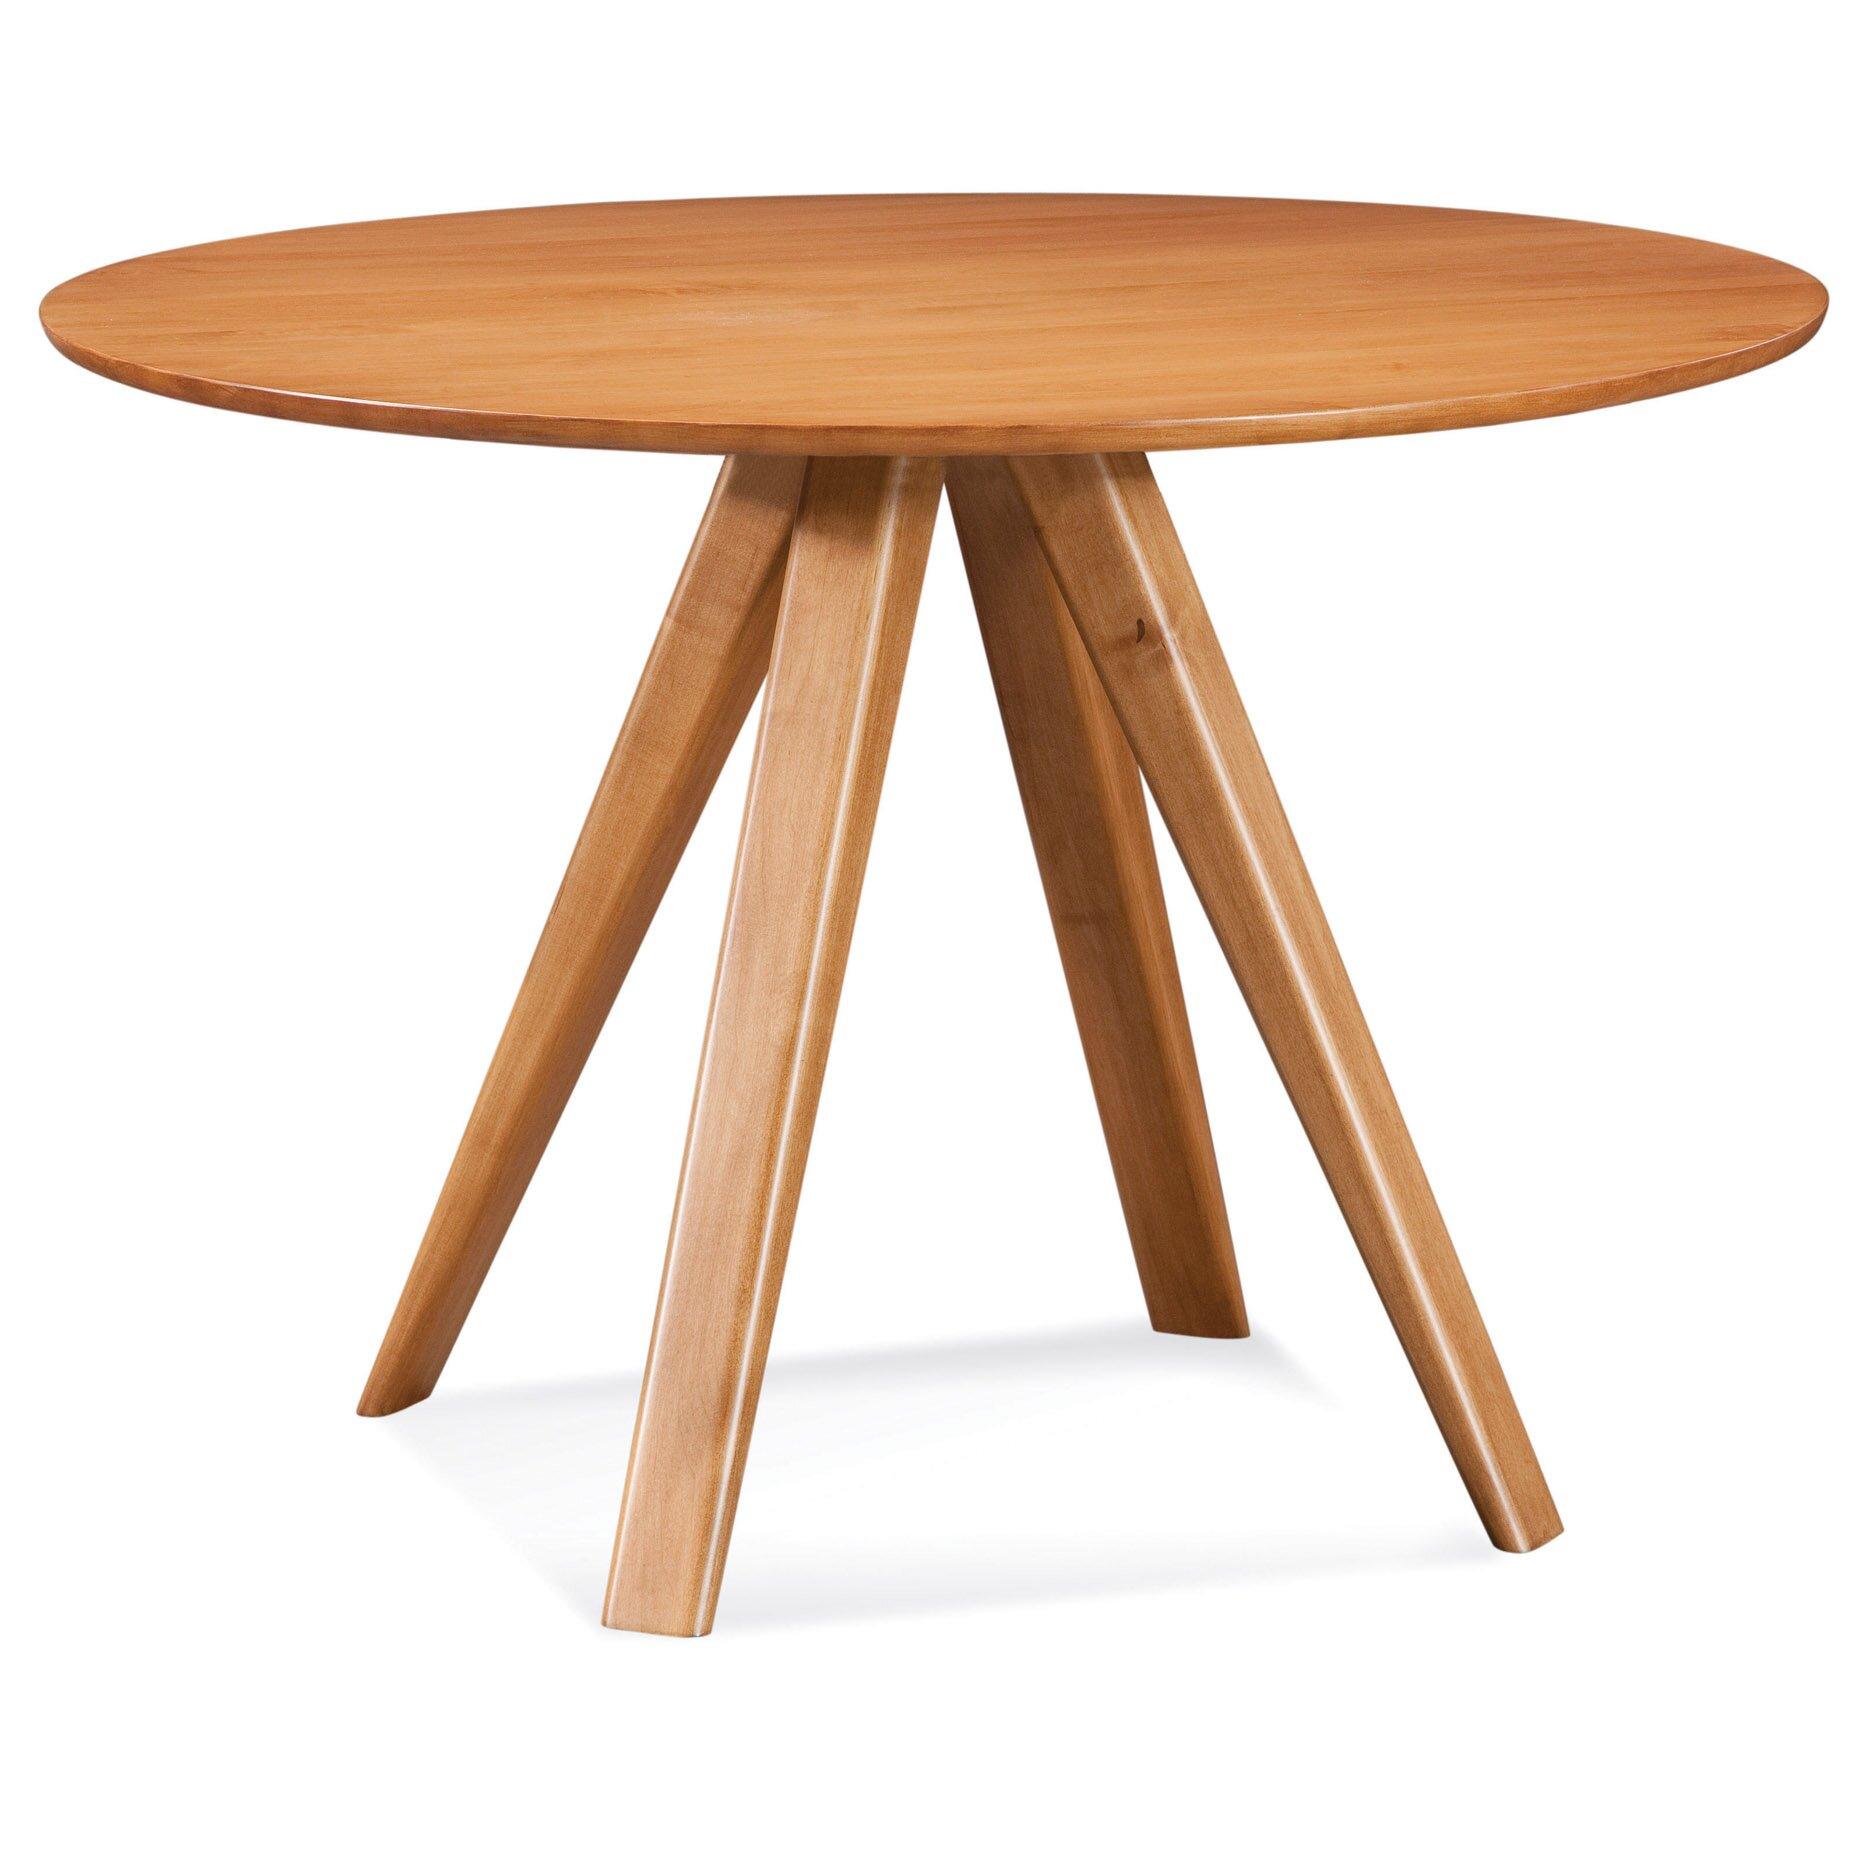 Saloom Furniture Avon 42 Dining Table Reviews Wayfair